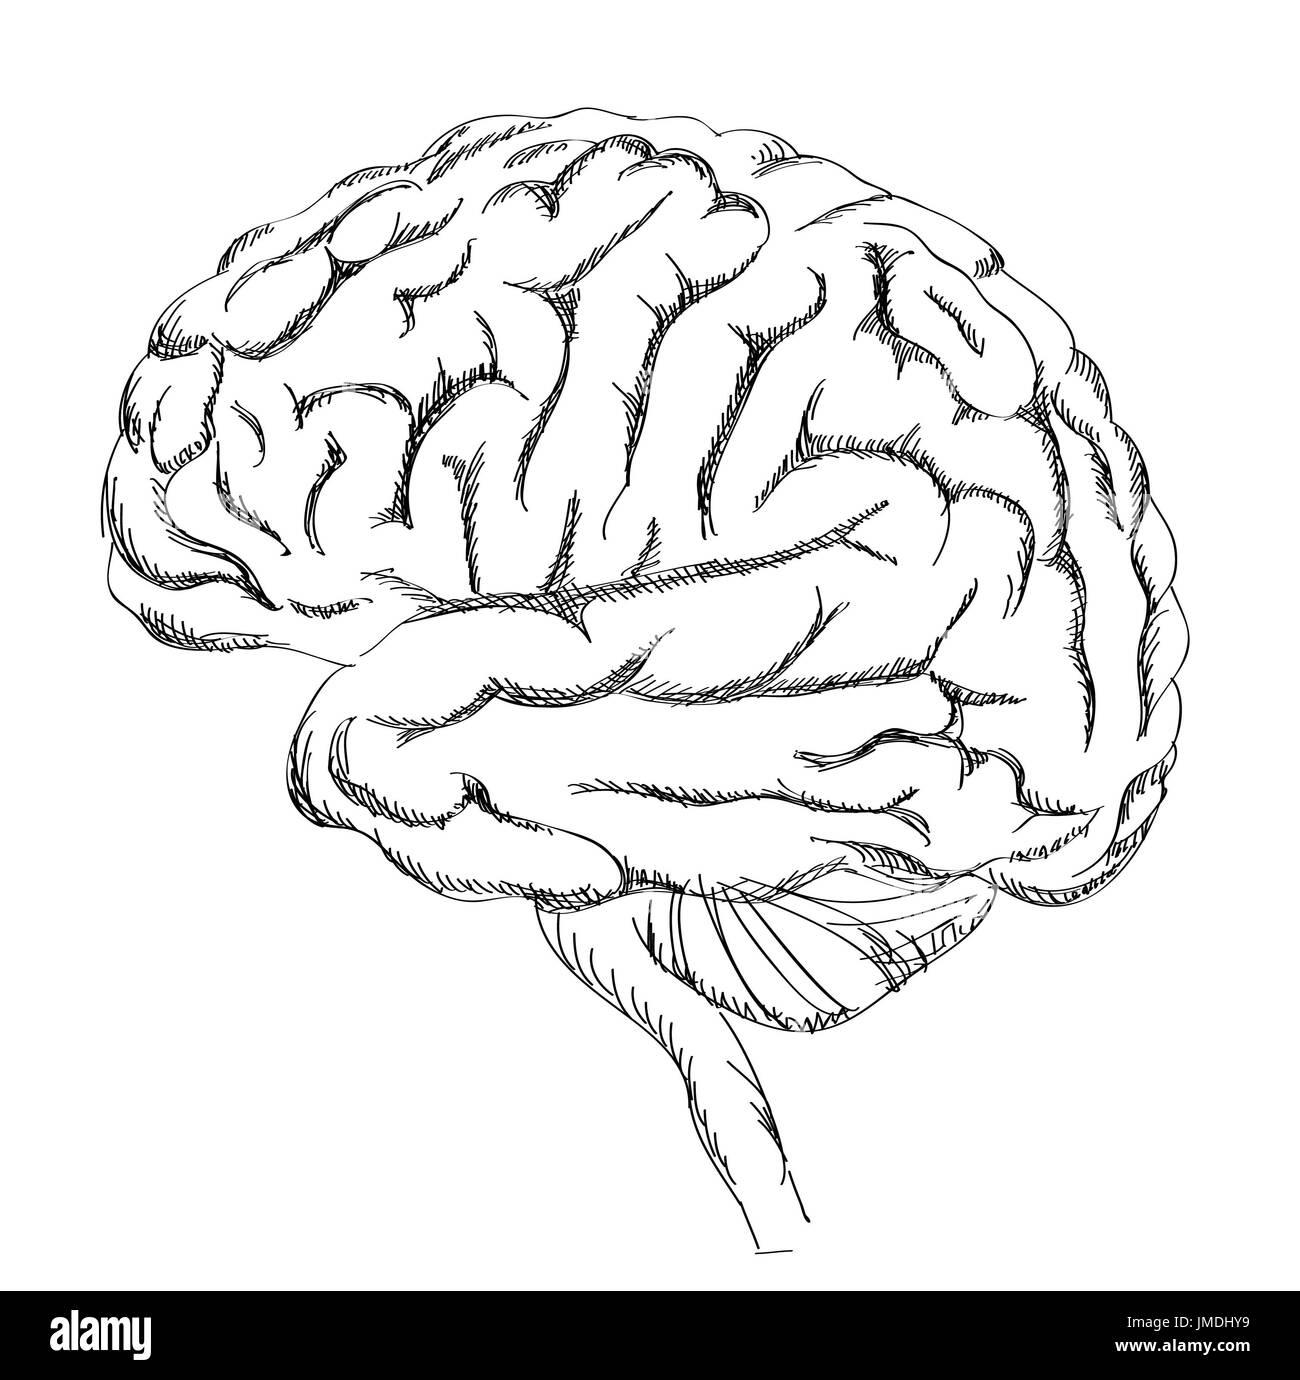 Brain Anatomy Human Brain Lateral View Sketch Illustration